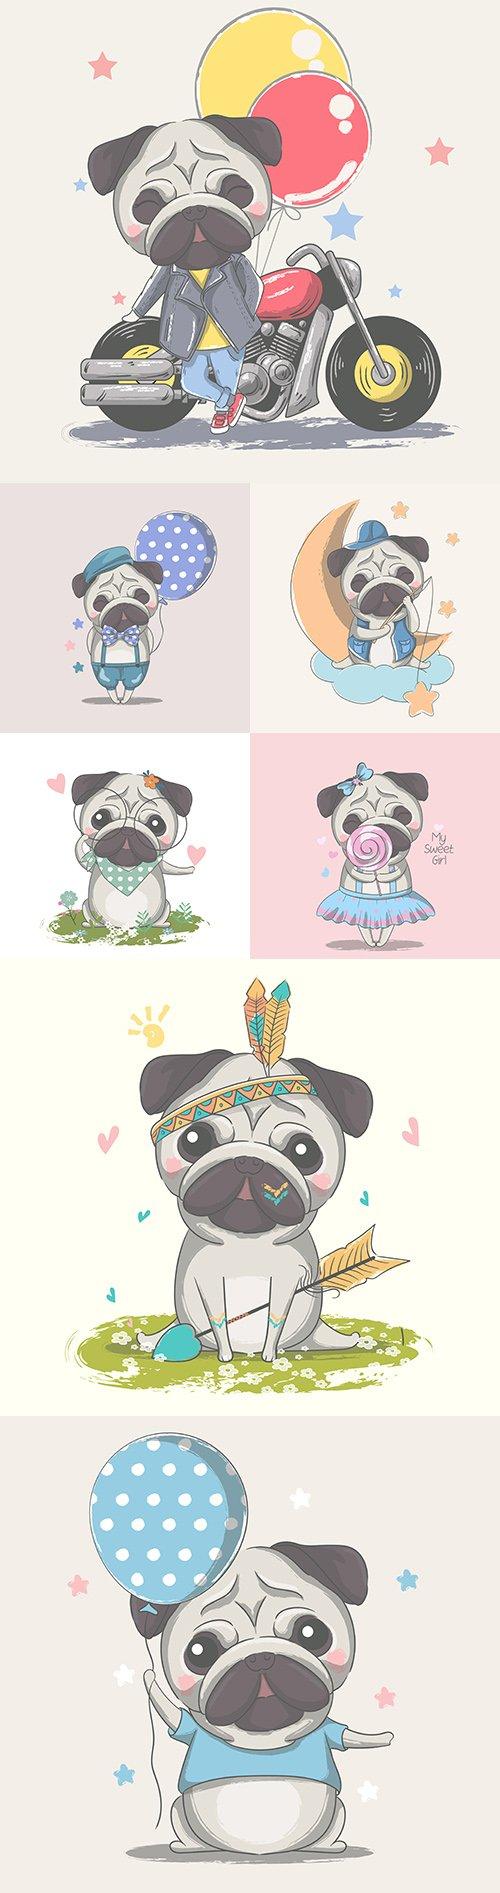 Painted cute little mops cartoon illustration